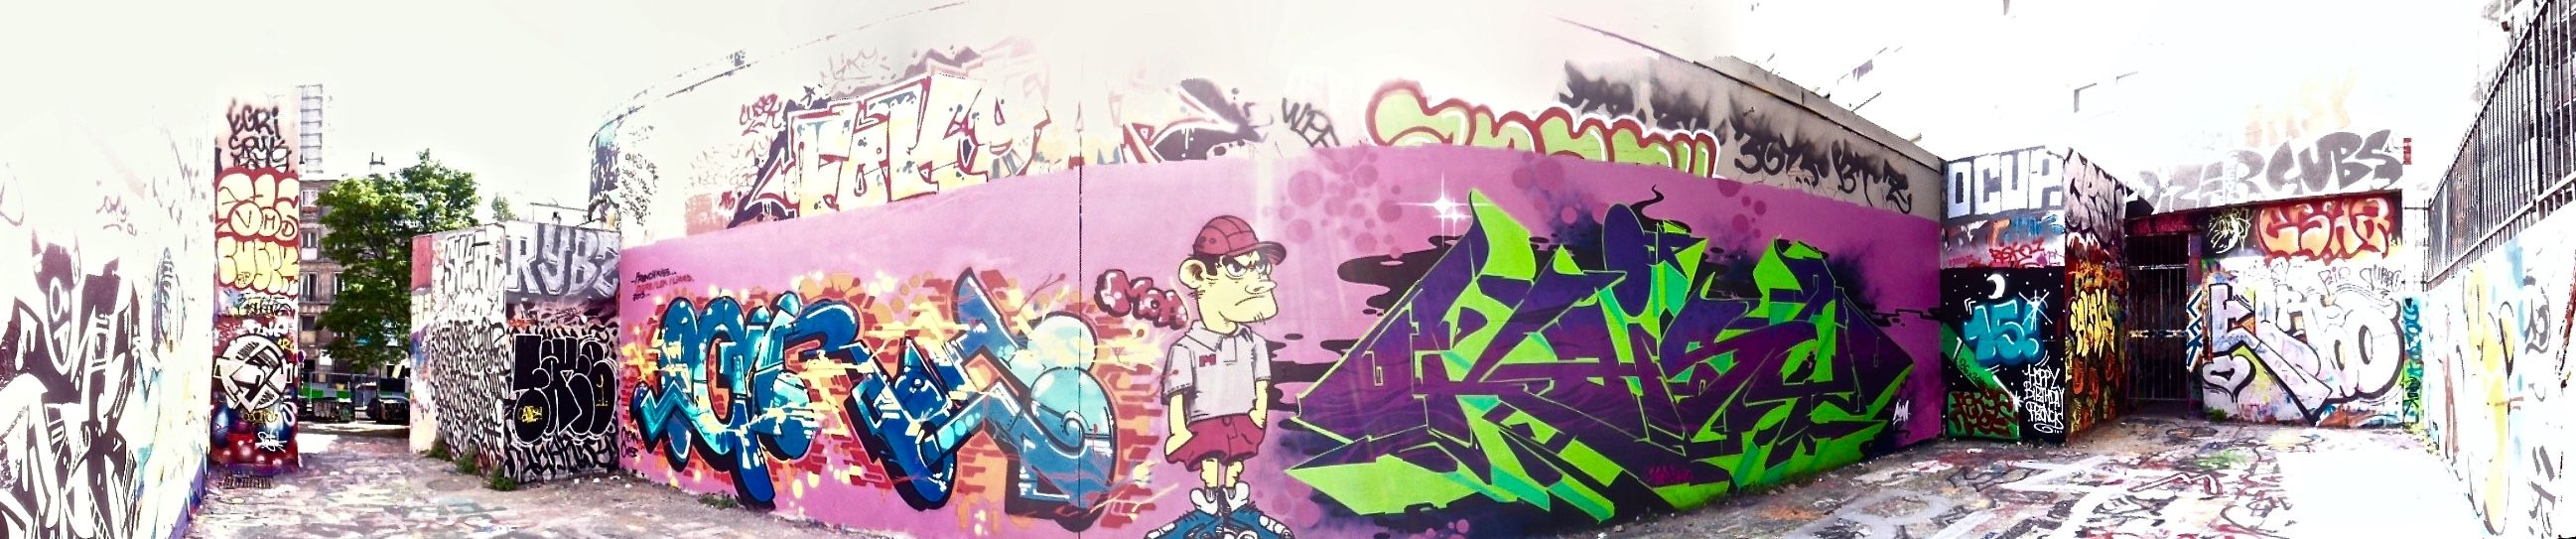 Bombing art - Paris 20